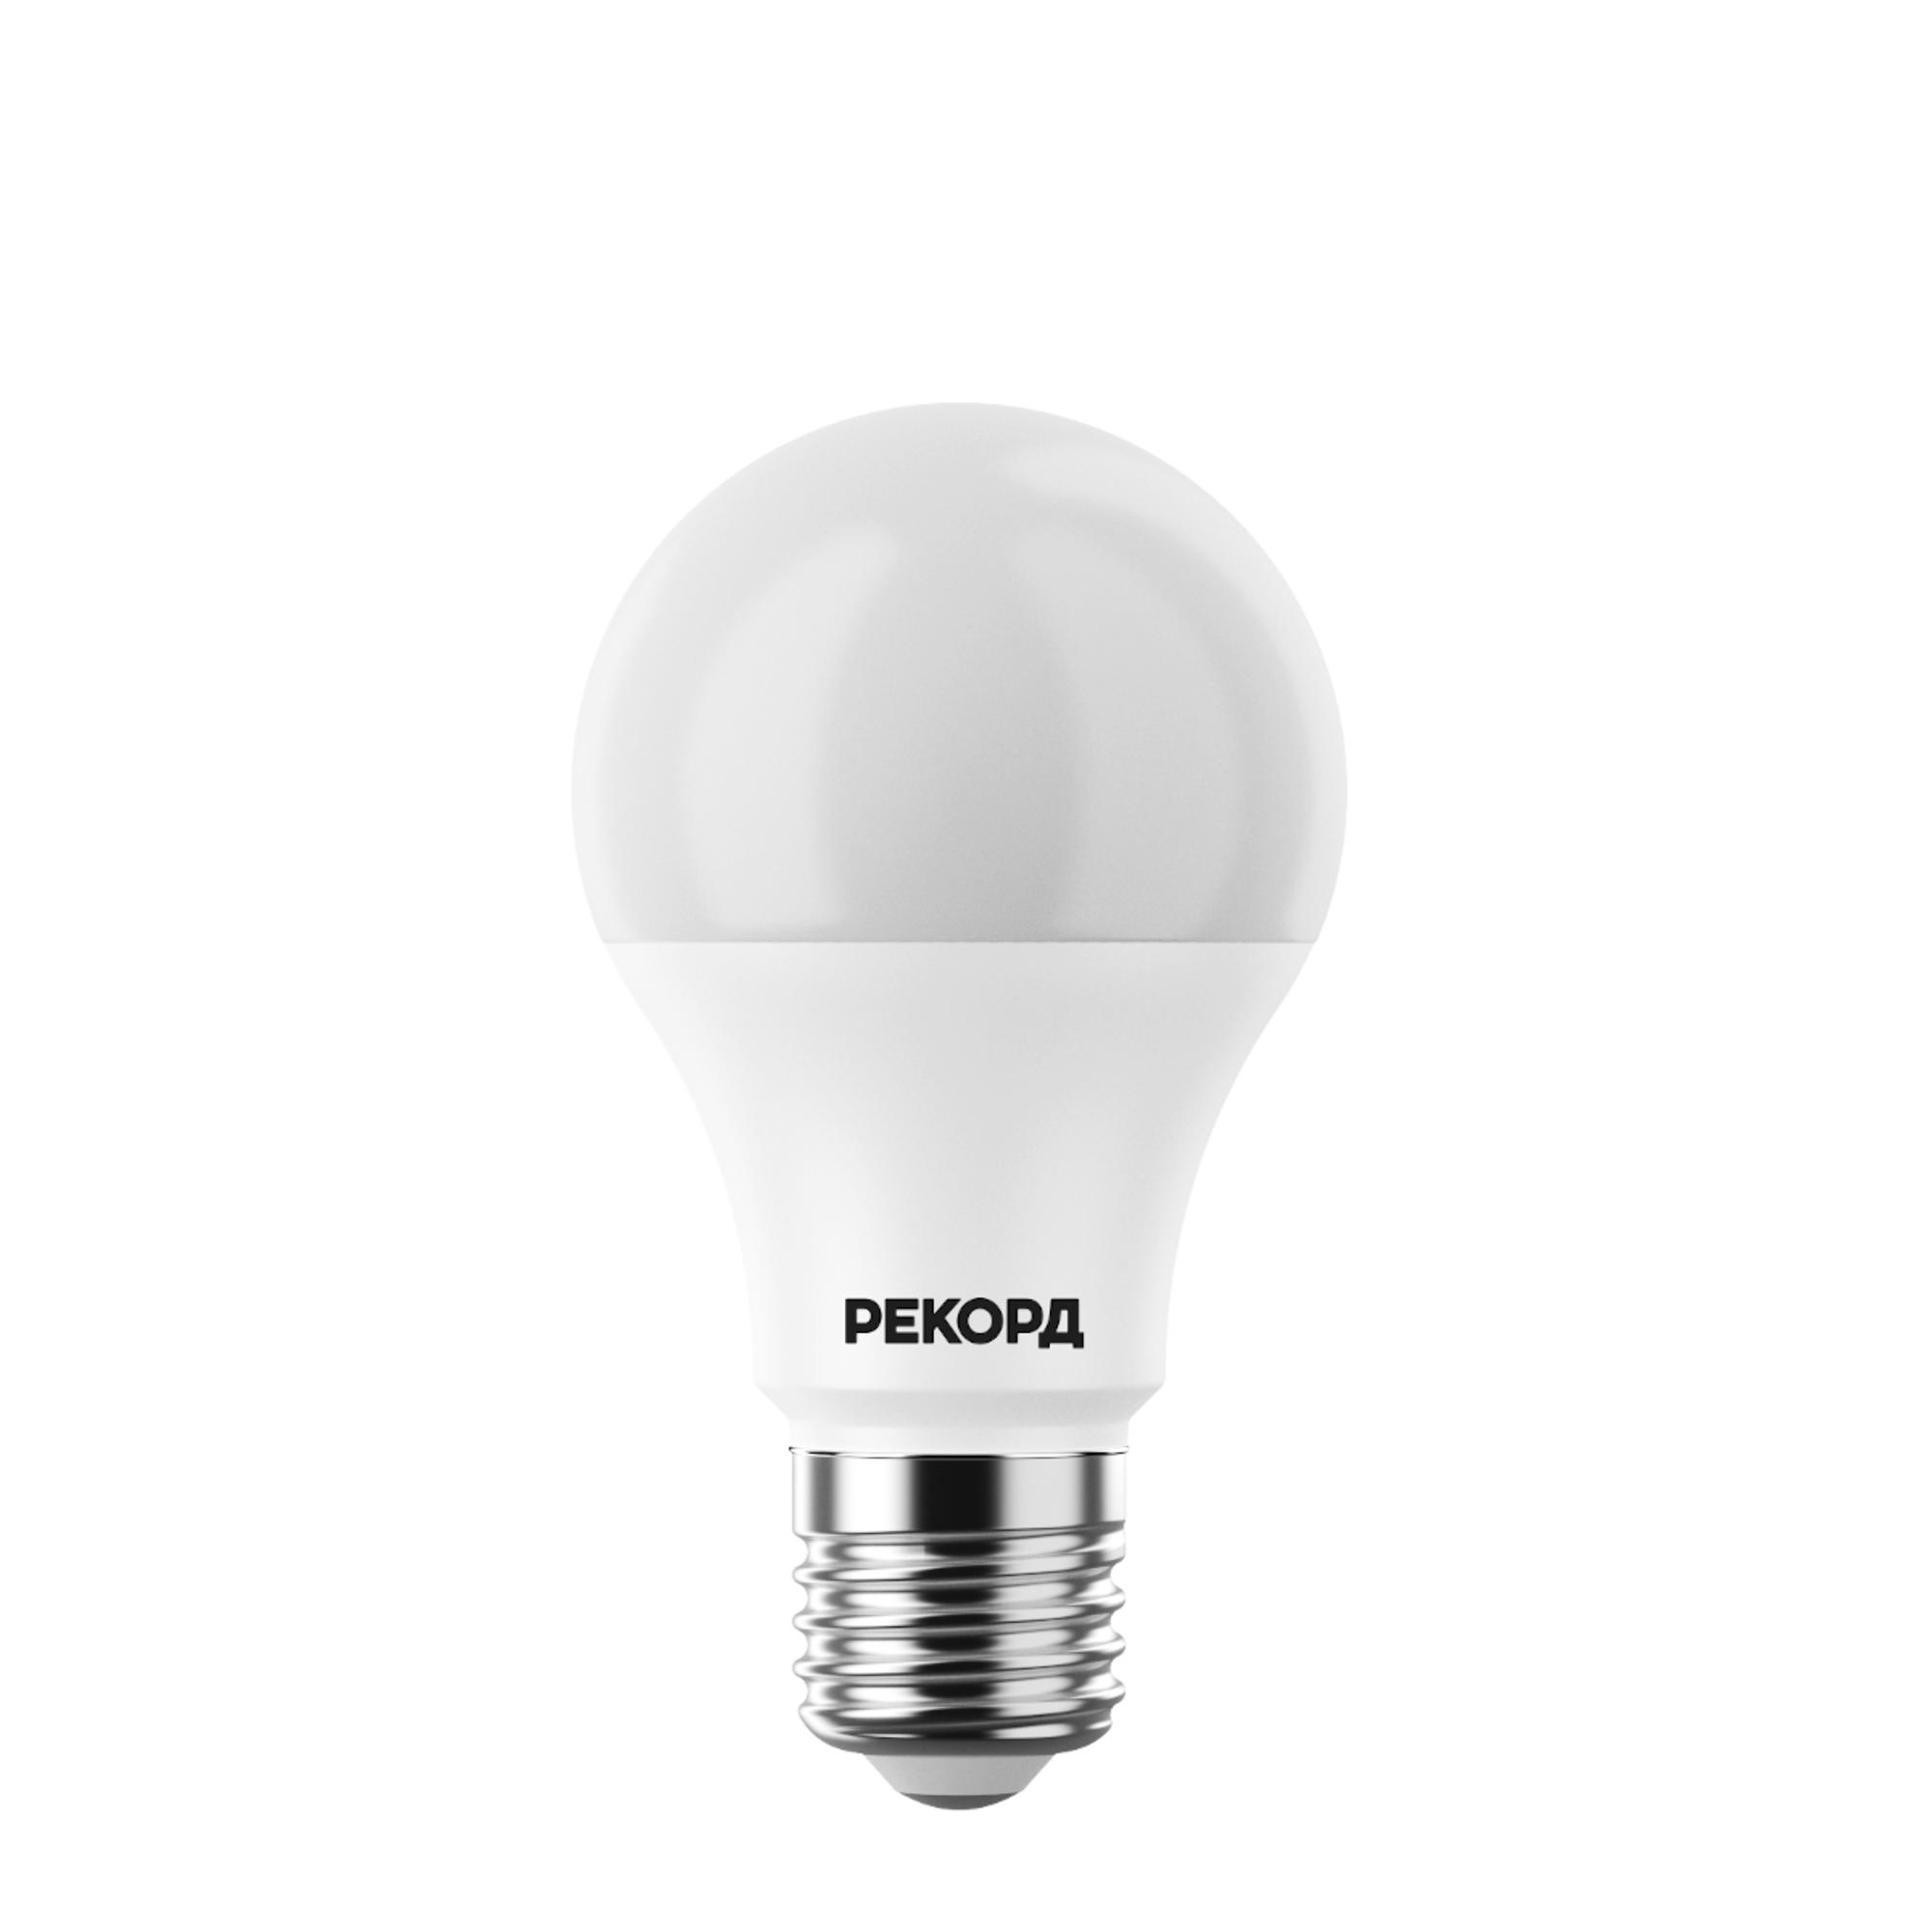 Светодиодная лампочка Рекорд 23878 E27 120 Лм 12 Вт